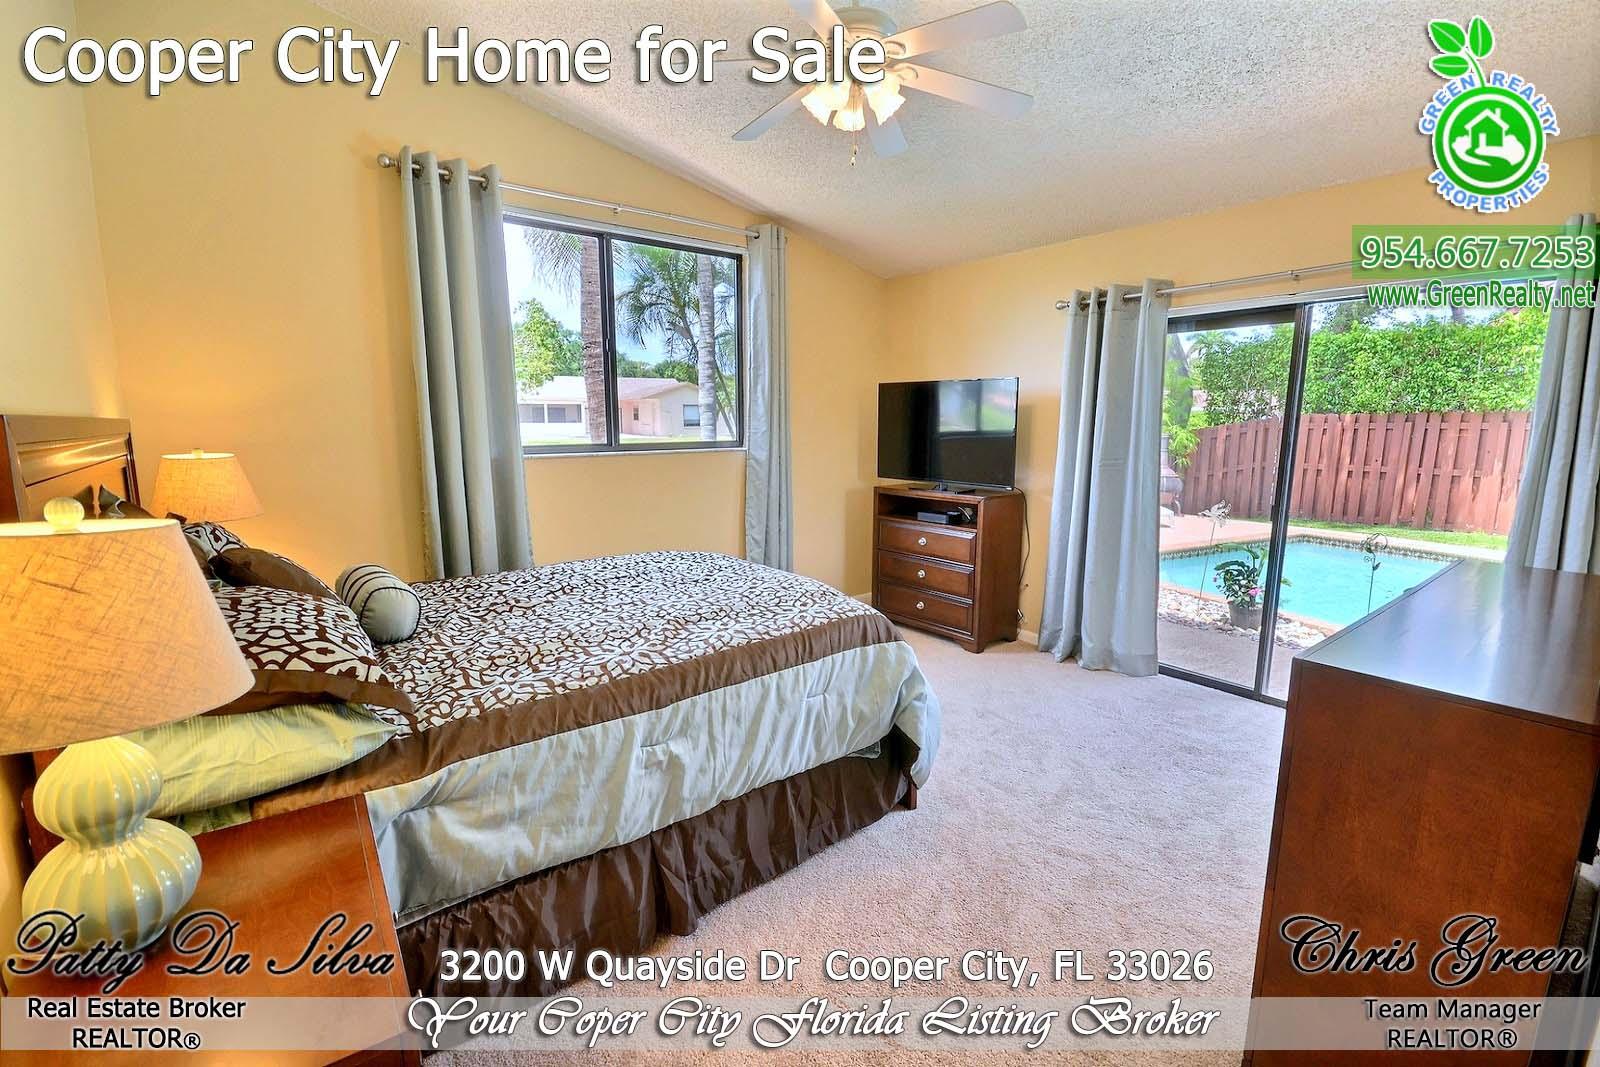 21 Cooper City Homes (4)